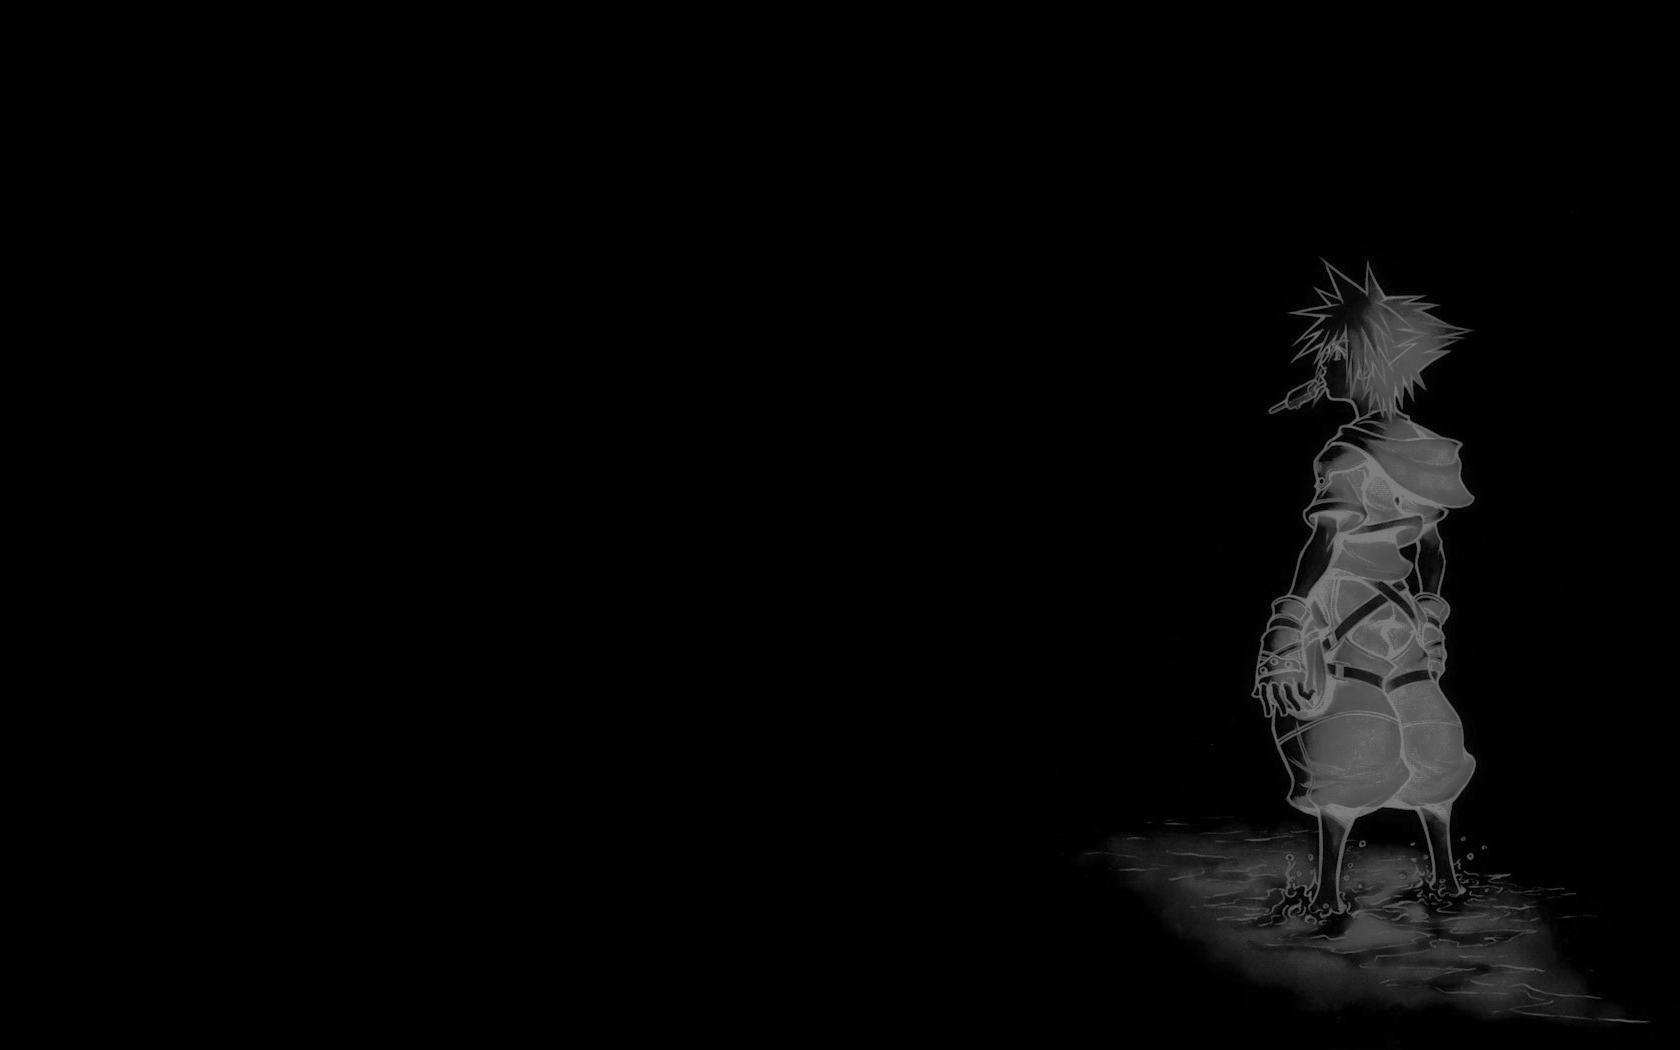 Kingdom Hearts Sora Kingdom Hearts Hd Wallpapers Your HD